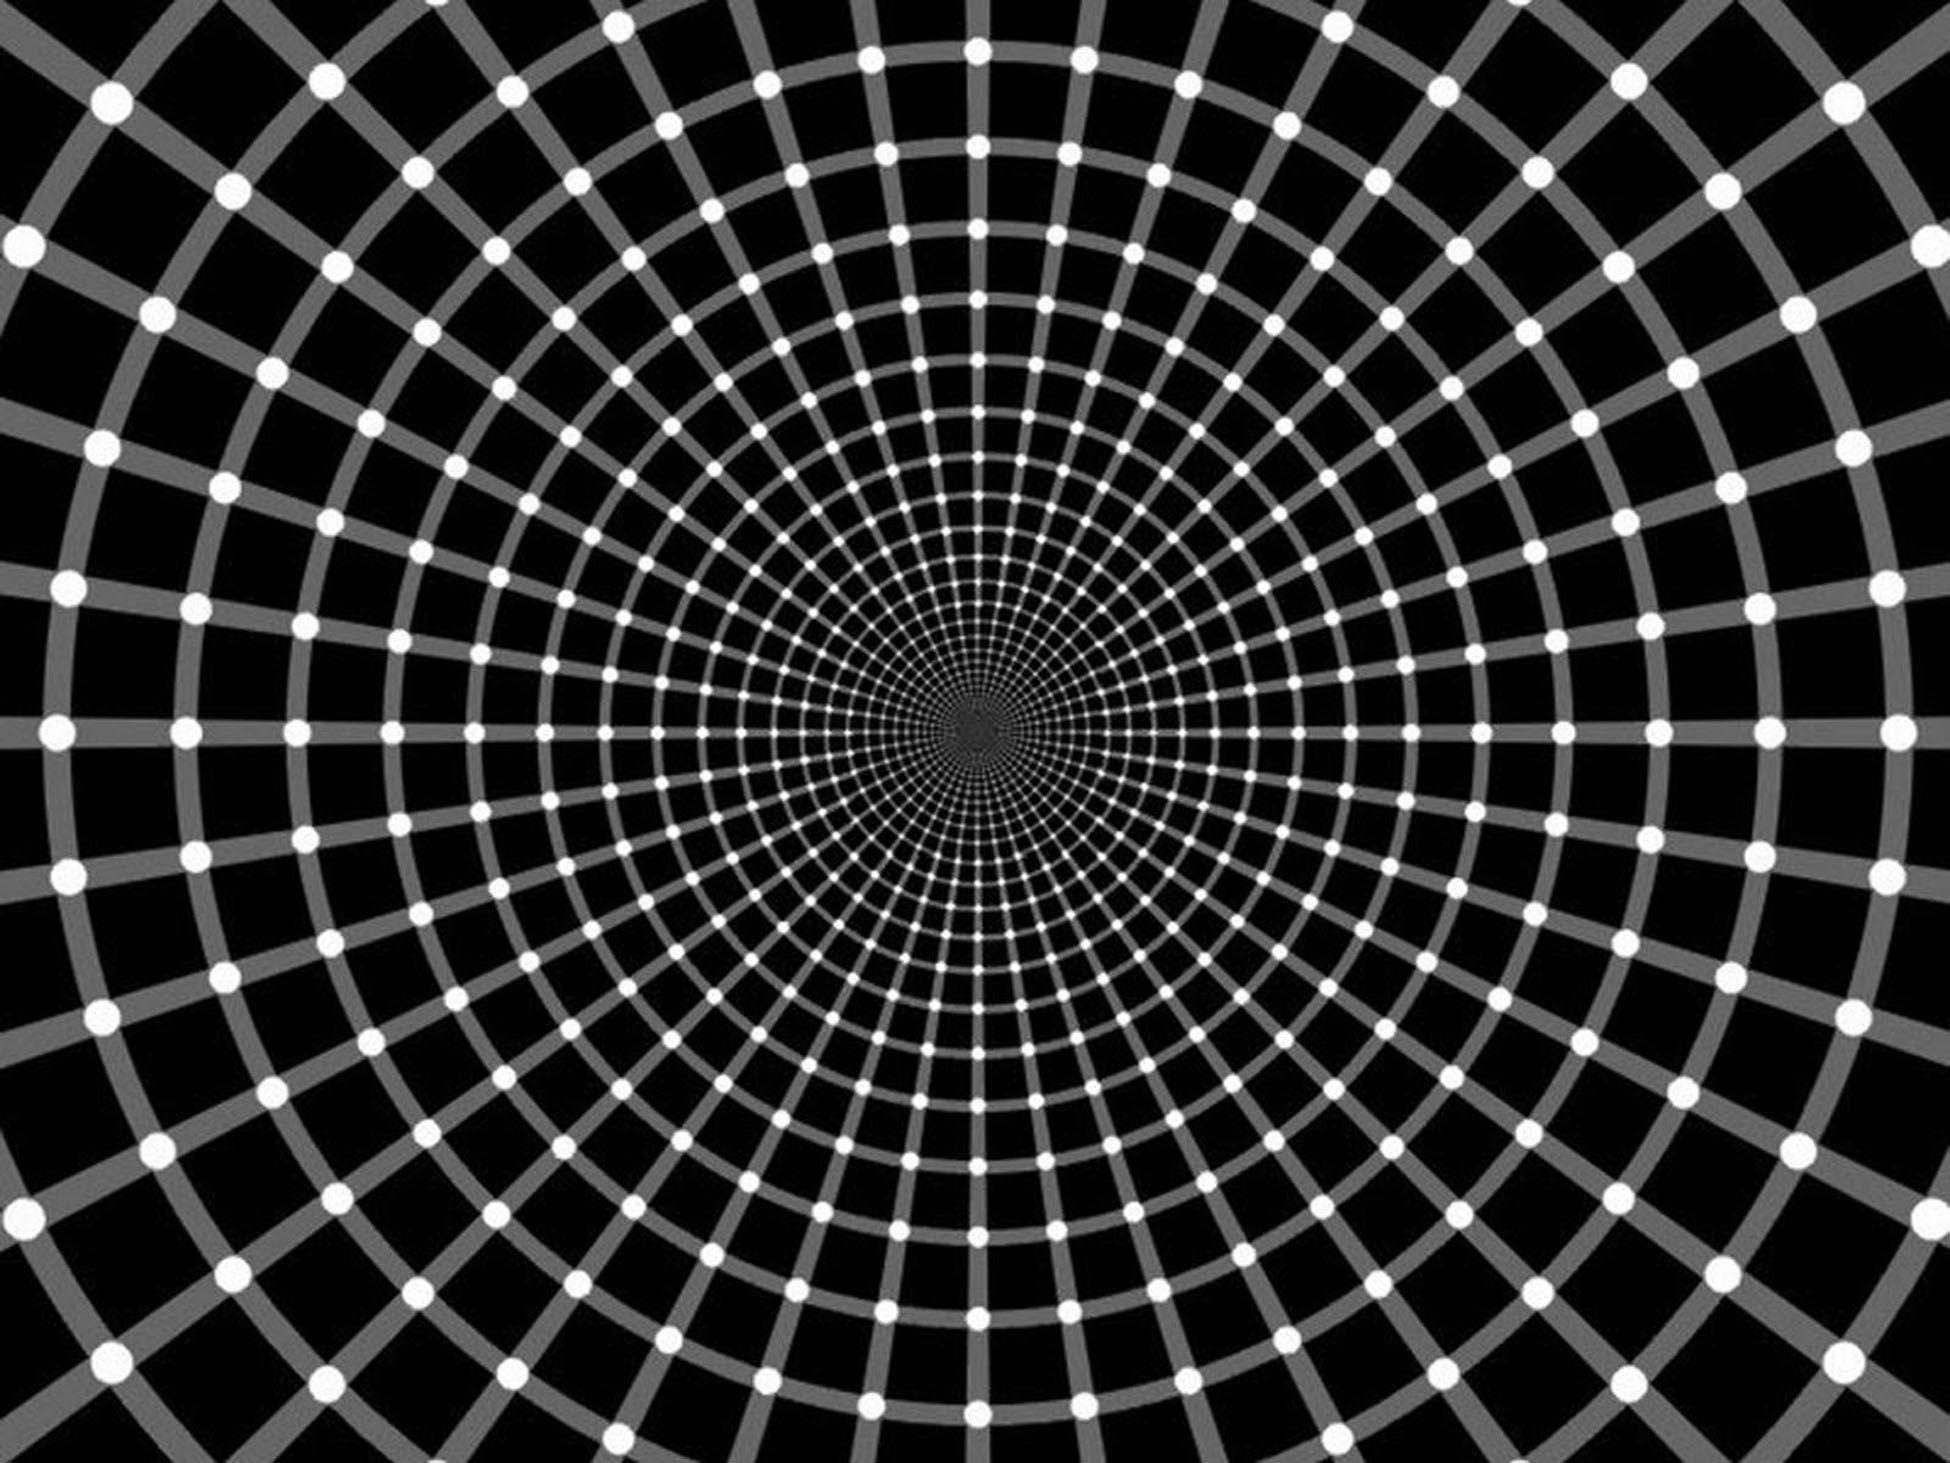 Photos illusion car moving optical illusion spectacular optical - Trippy Moving Illusions Backgrounds Moving Illusions Wallpaper Optical